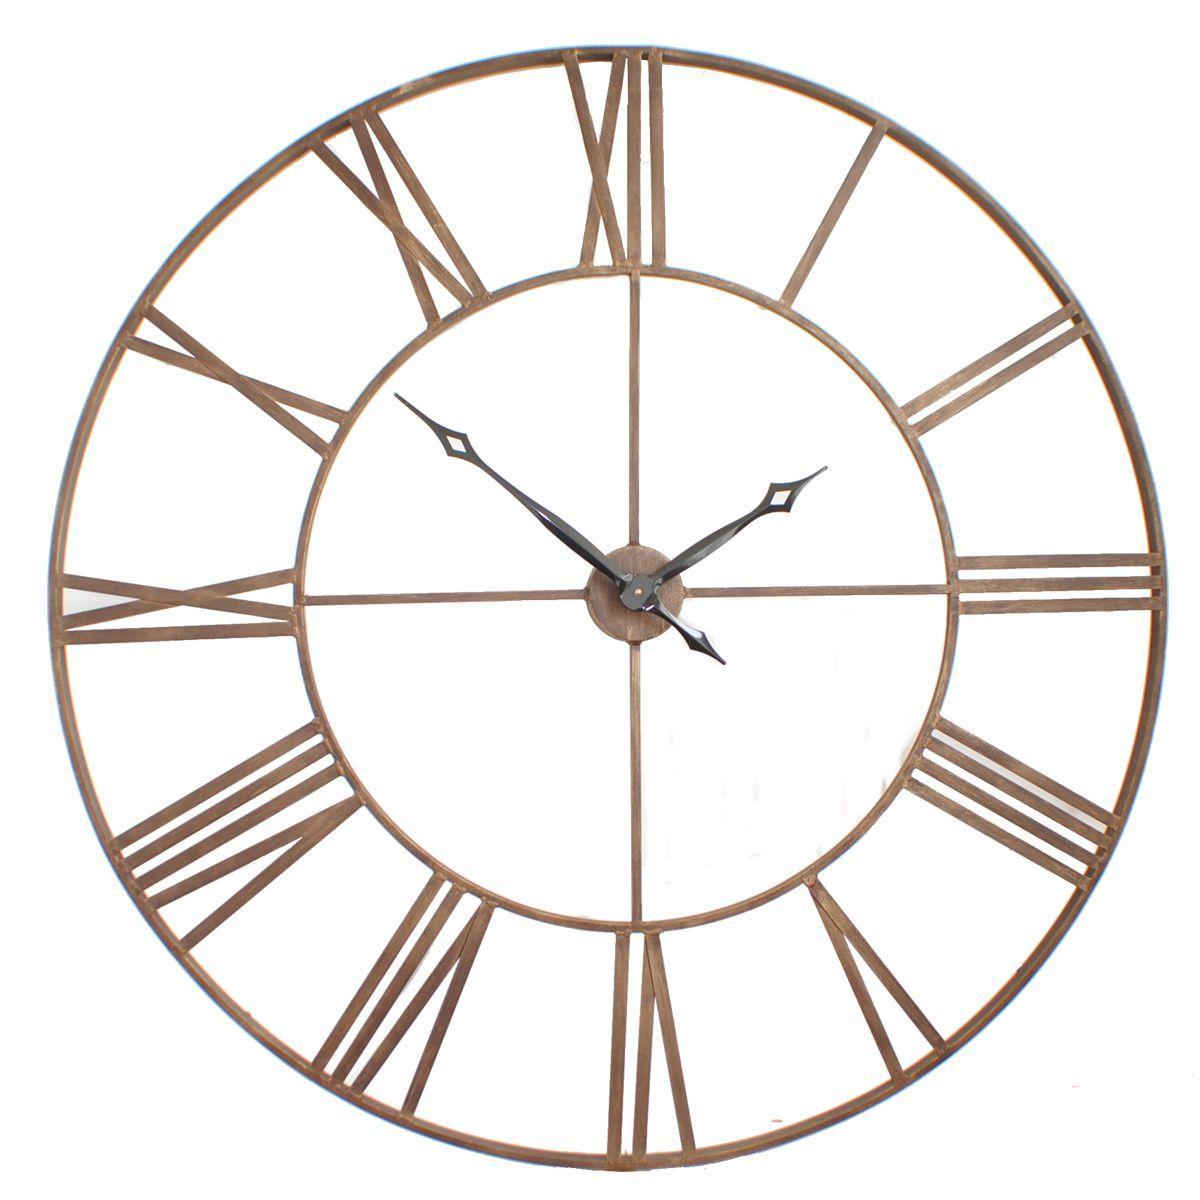 120cm Diameter BRONZE Home Pinterest Wall clocks Roman and